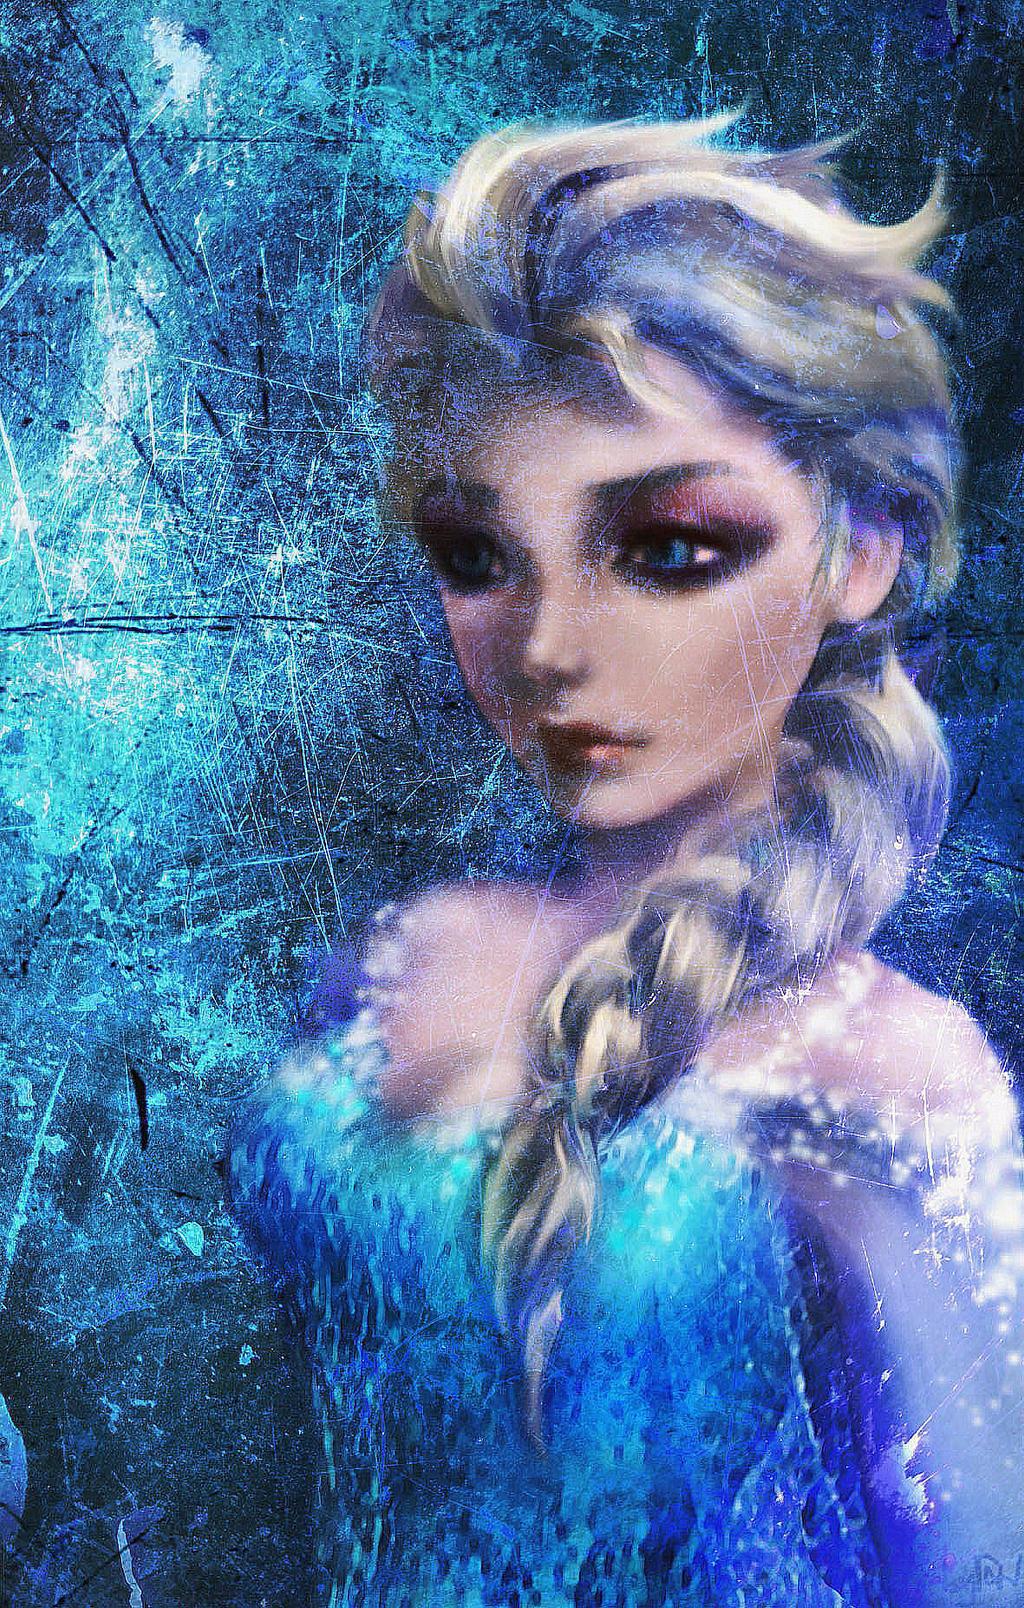 The Ice Maiden by Diyriko